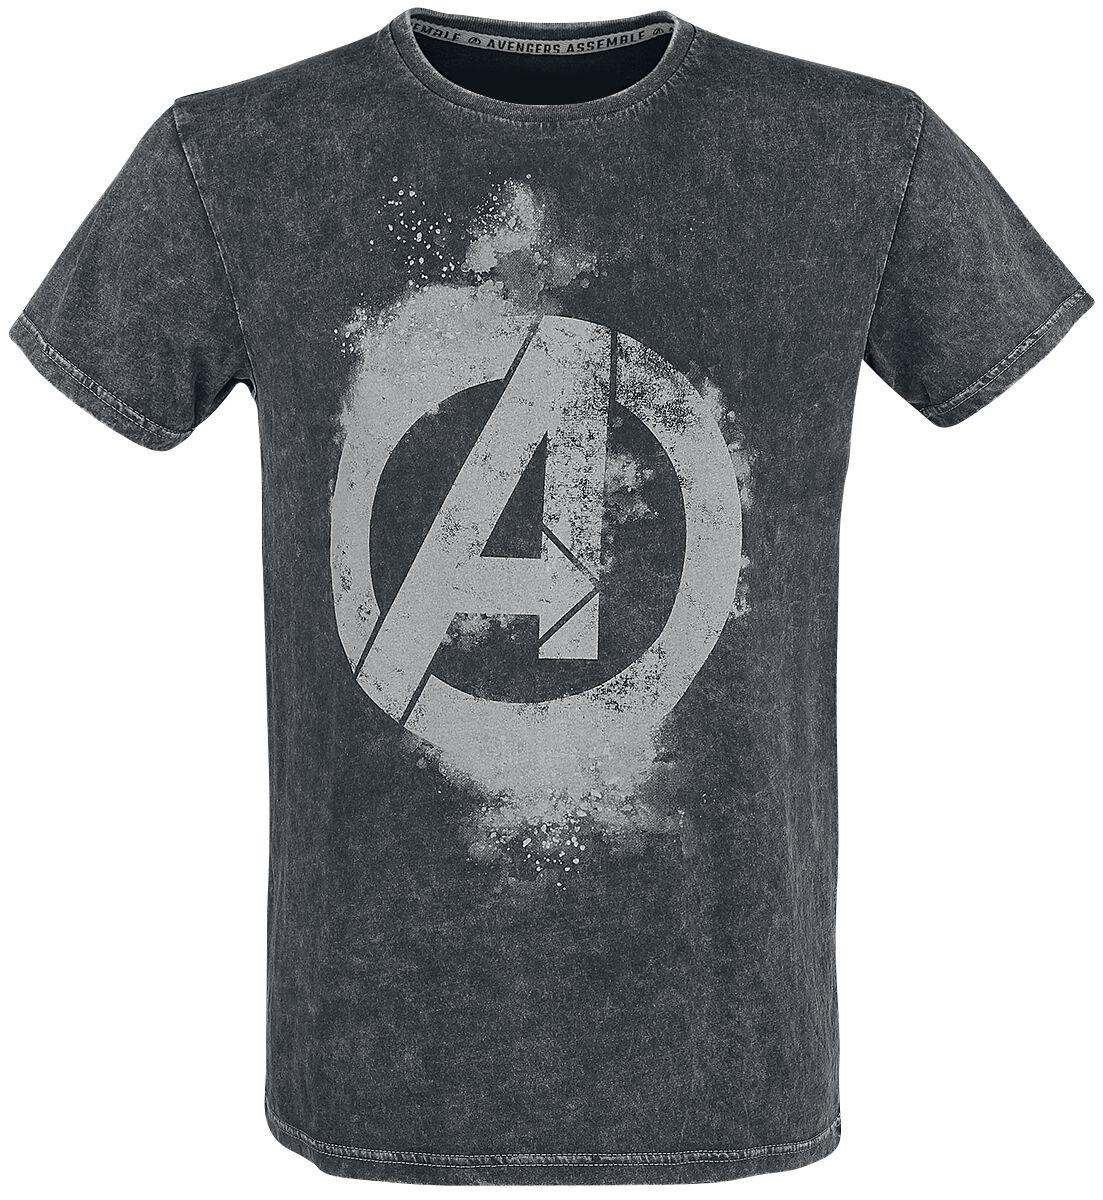 Image of Avengers Earth's Mightiest Heroes T-Shirt schwarz